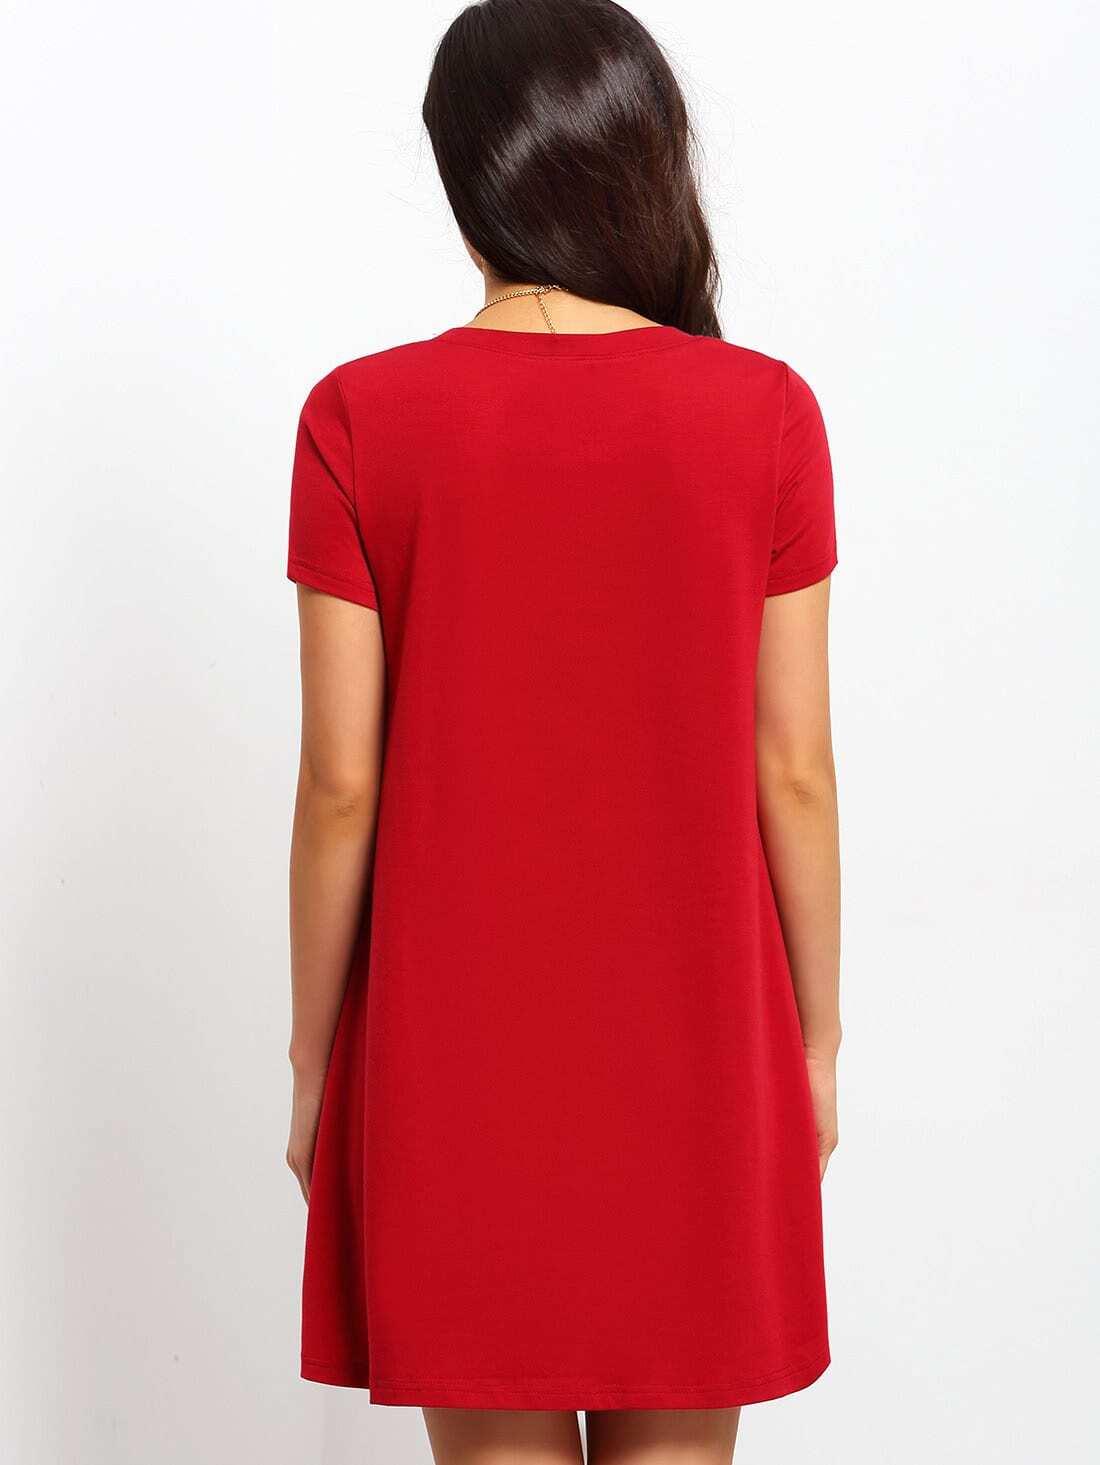 Red Dresses, Women's Dresses Online | SheIn.com